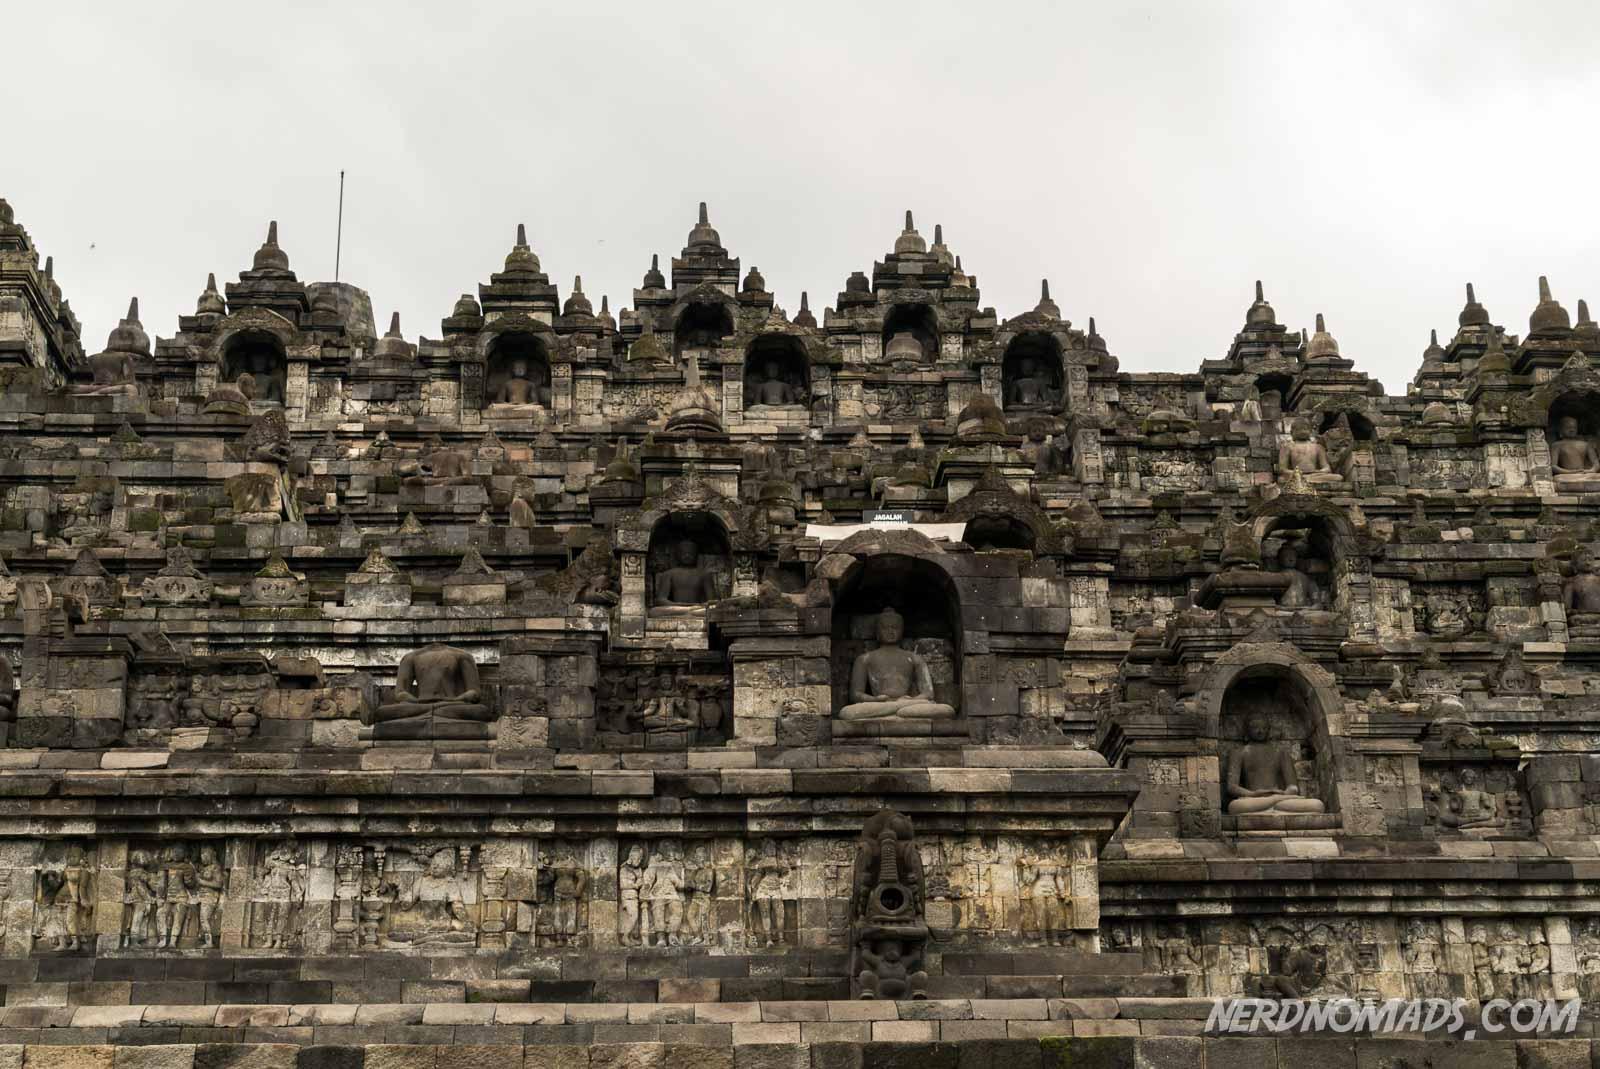 from dawn till dusk at borobudur temple nerd nomads